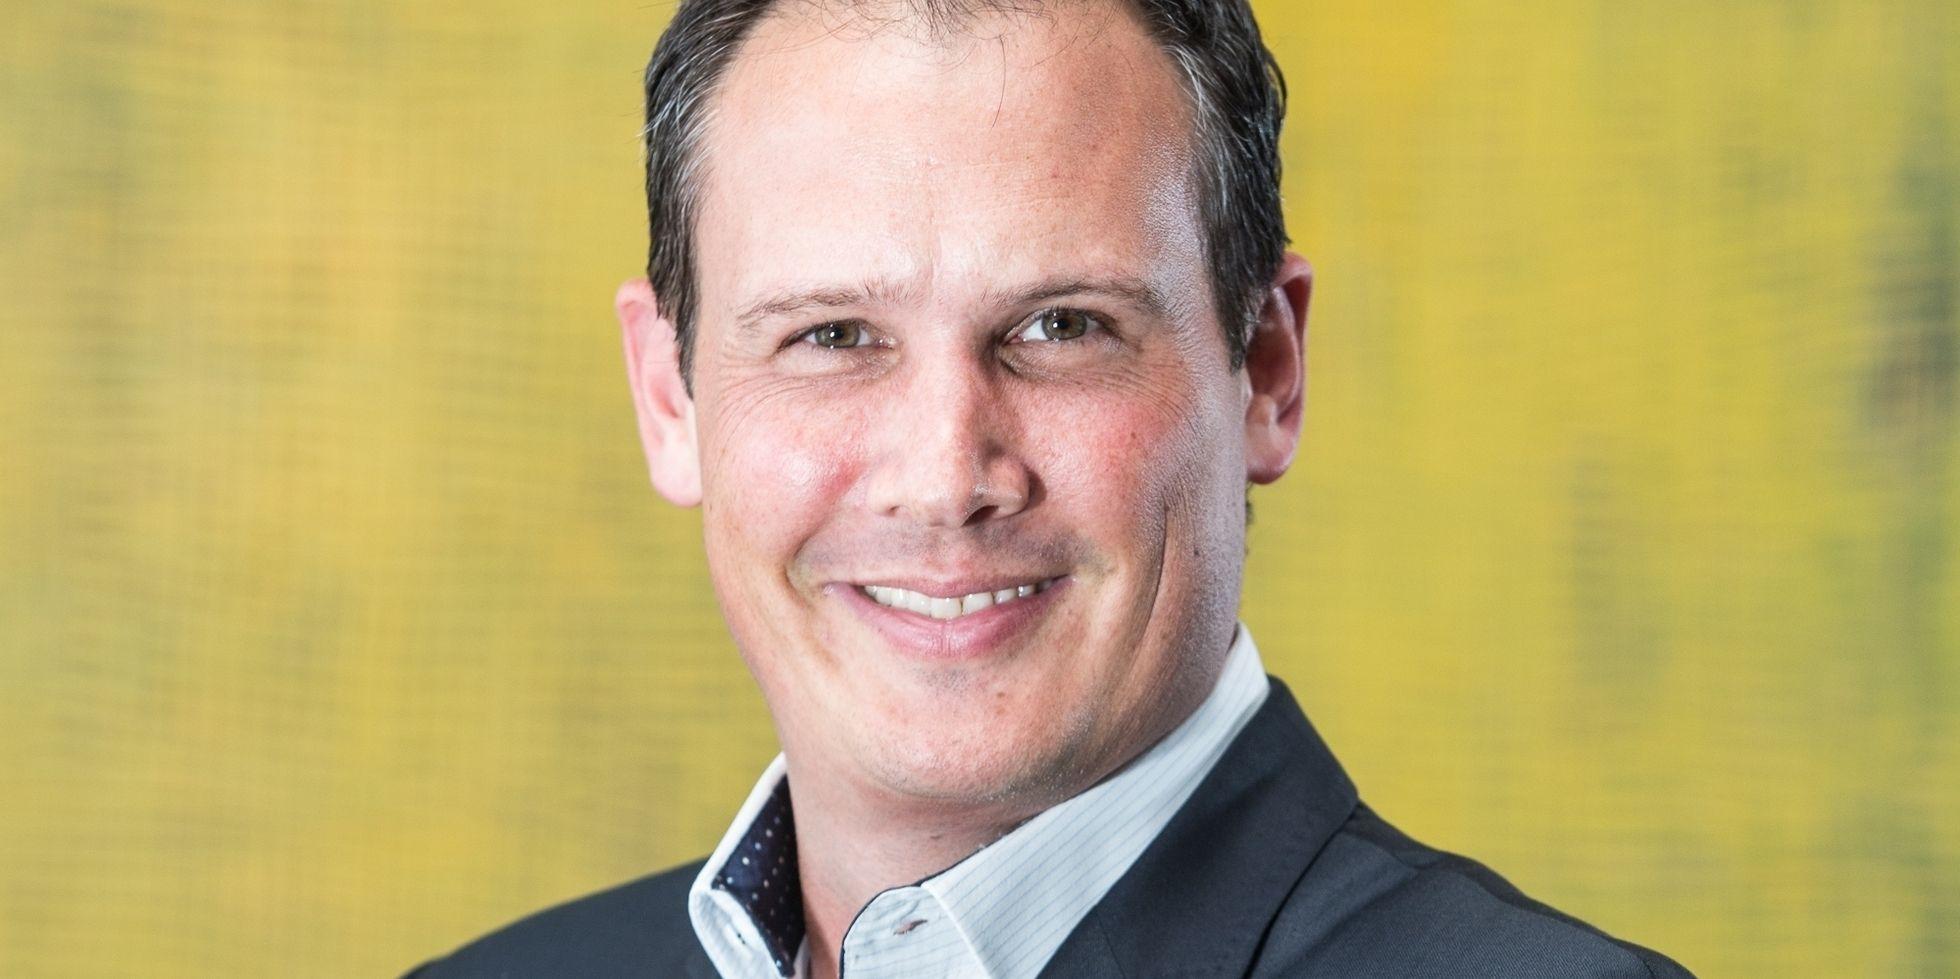 Marco Zanolari, General Manager, Grand Resort Bad Ragaz